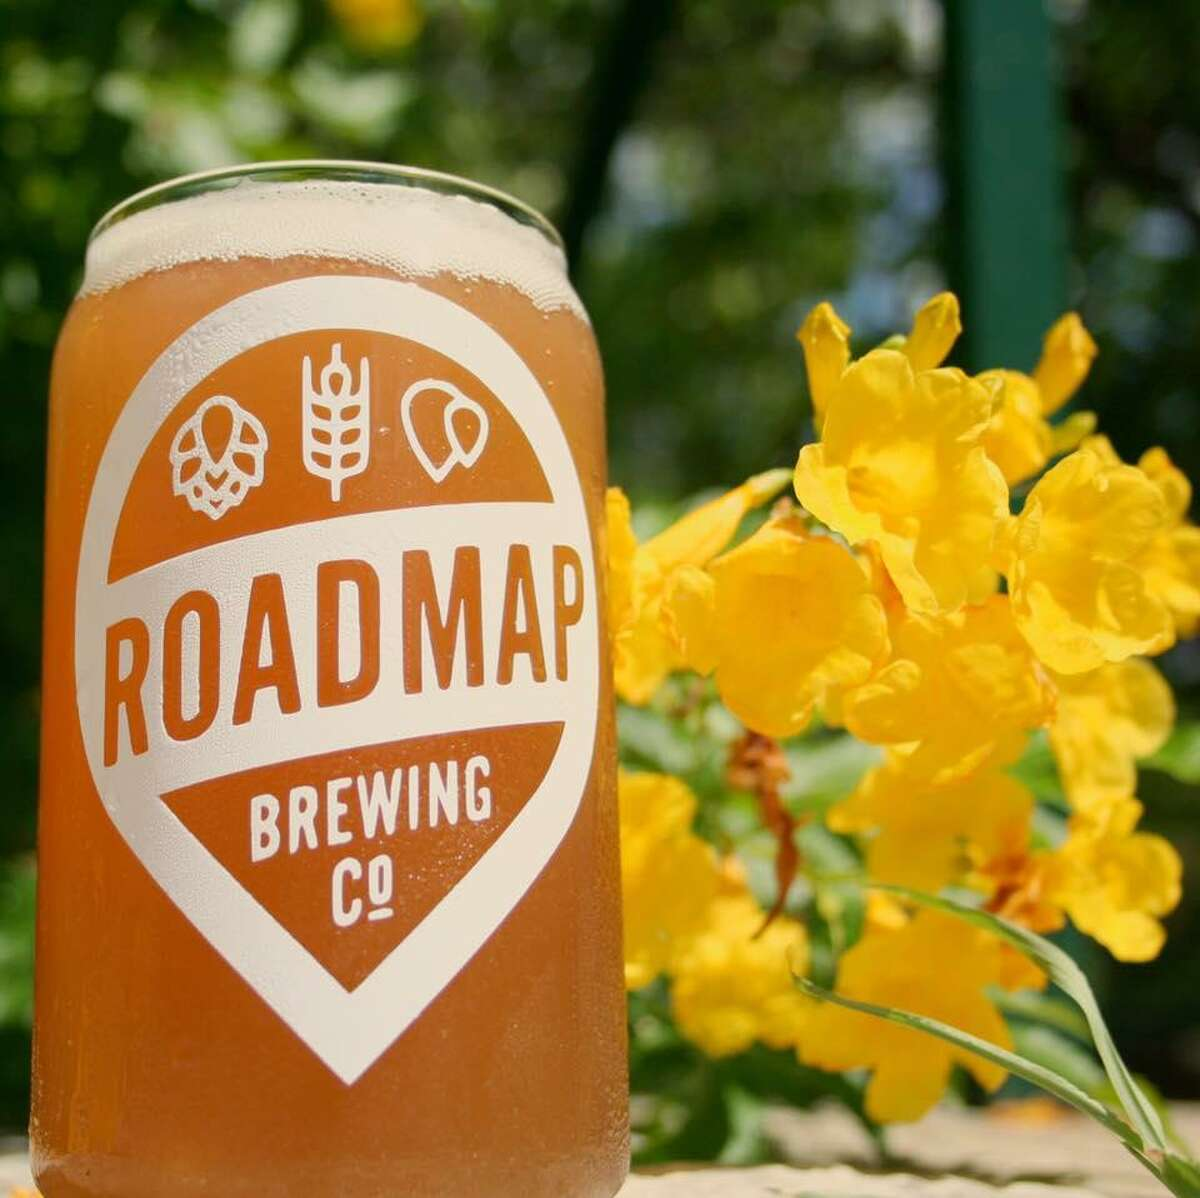 Mama Duke's IPA will be a flagship beer at Roadmap Brewing Co.